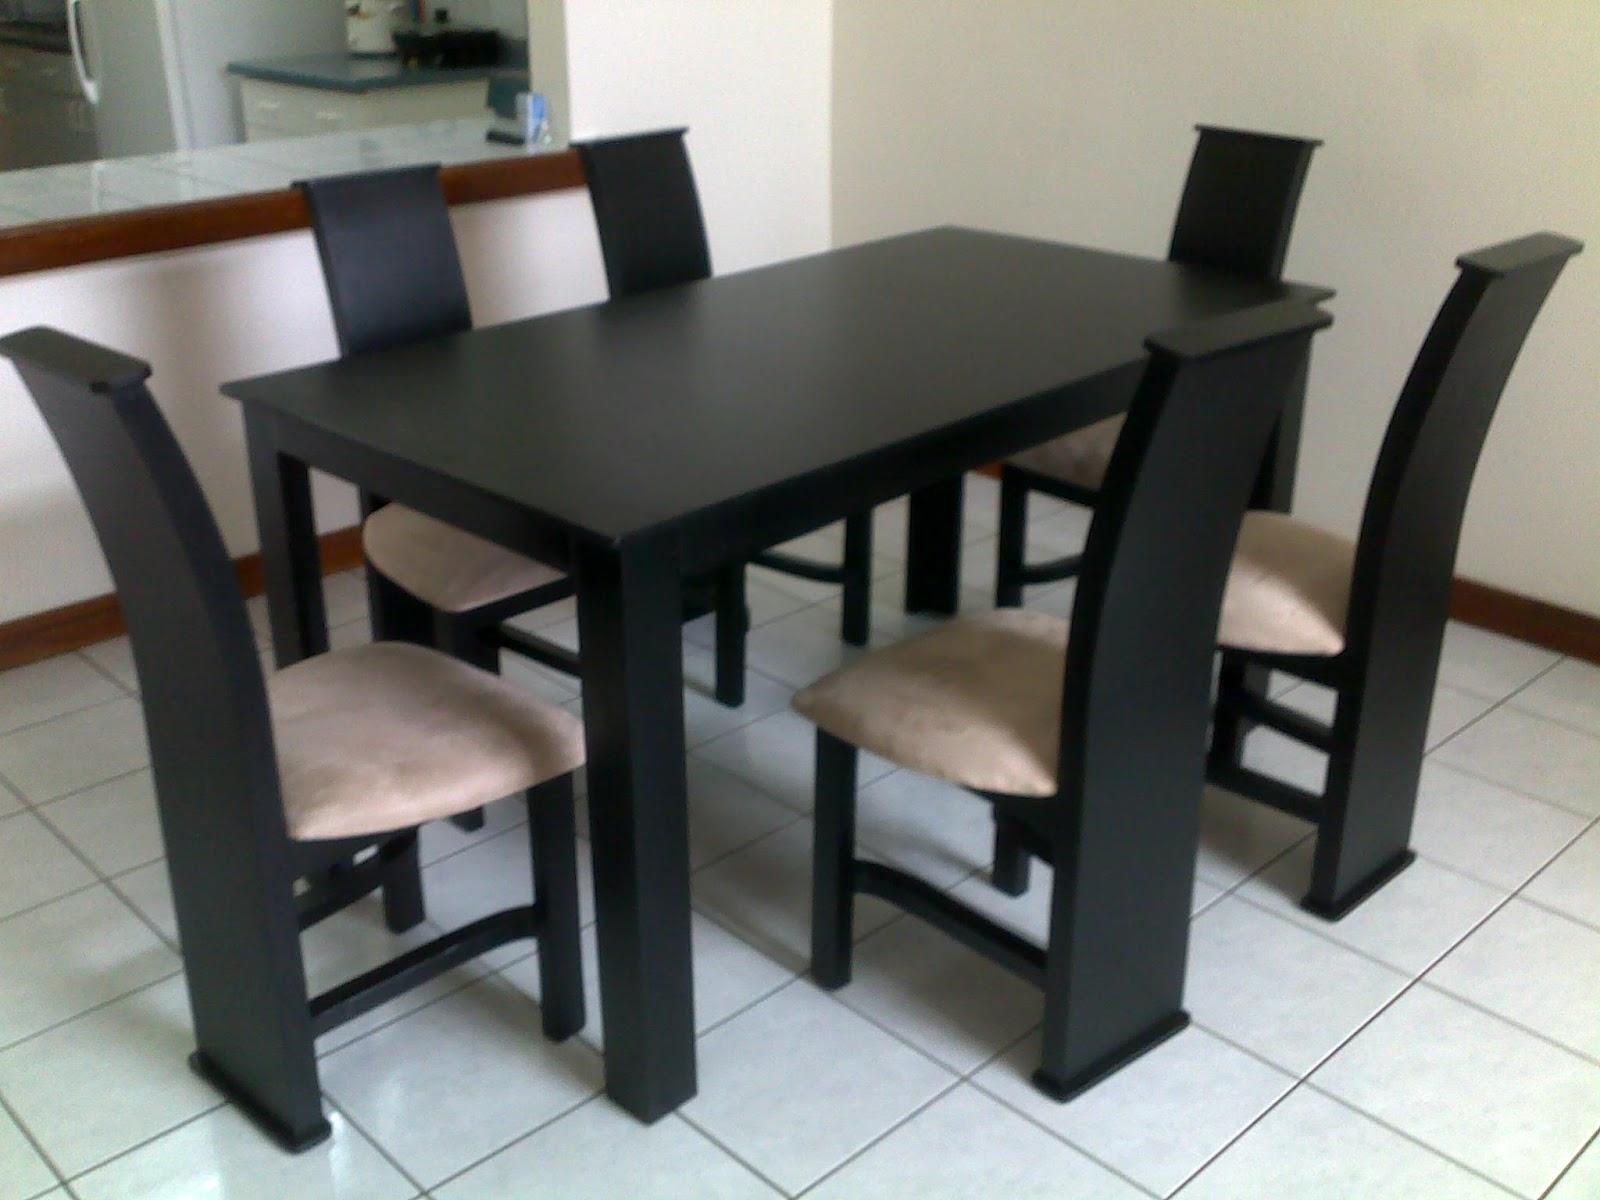 Muebles figo comedor seis sillas negro madera de pino chileno for Comedor seis sillas